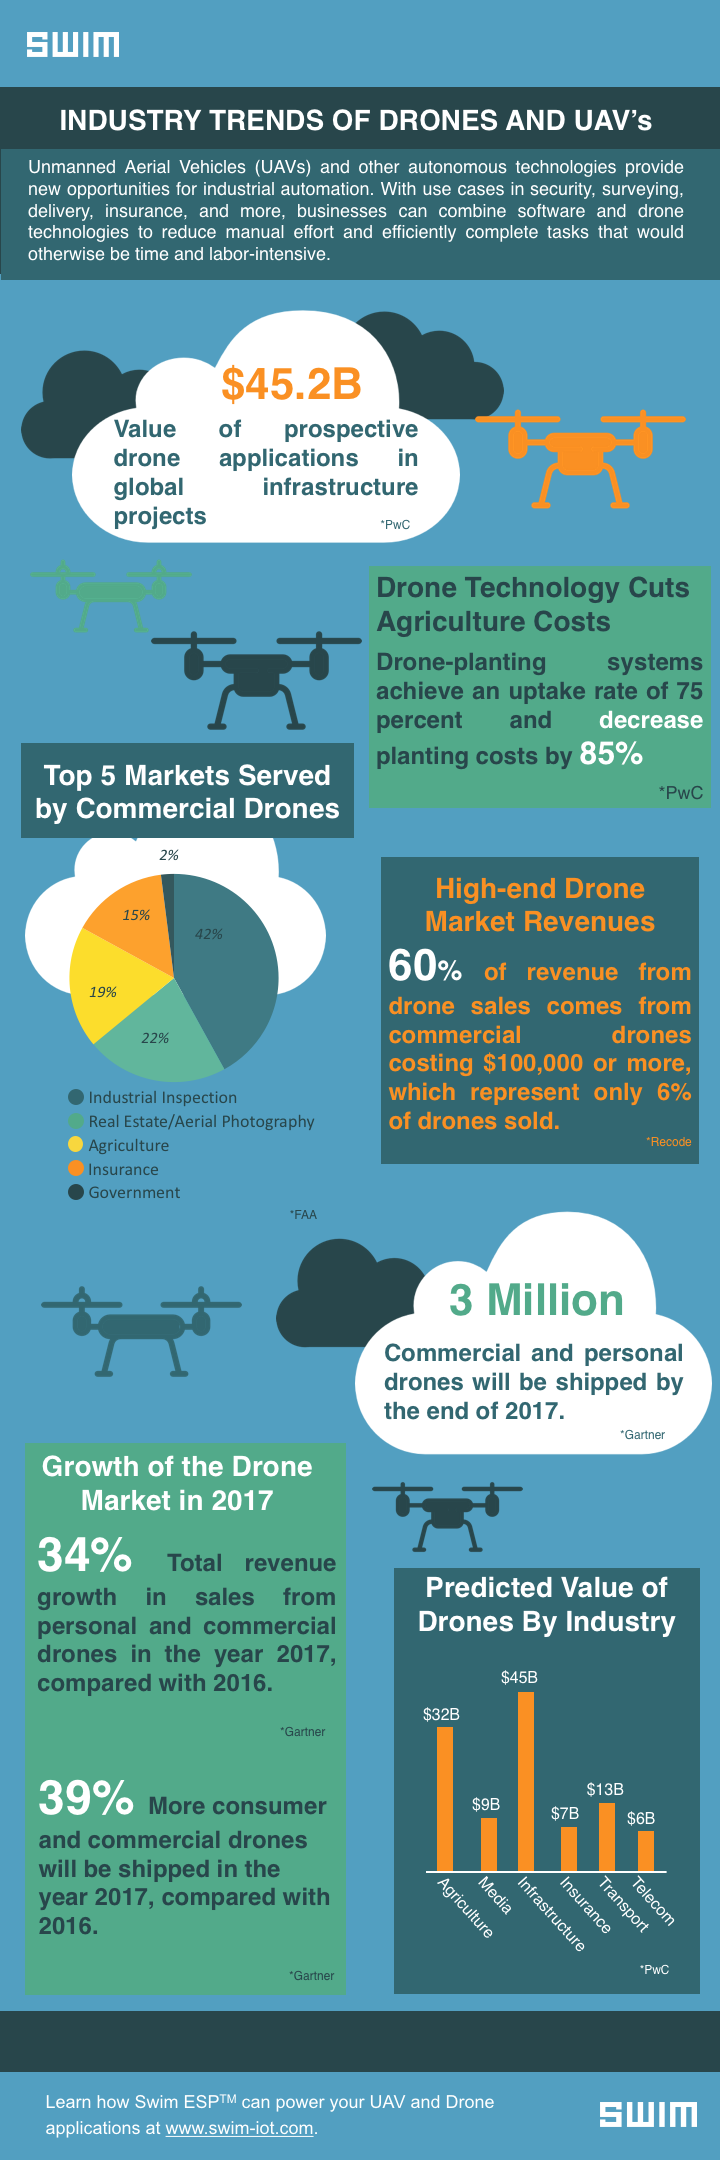 Swim_UAVs and Drones_Infographic